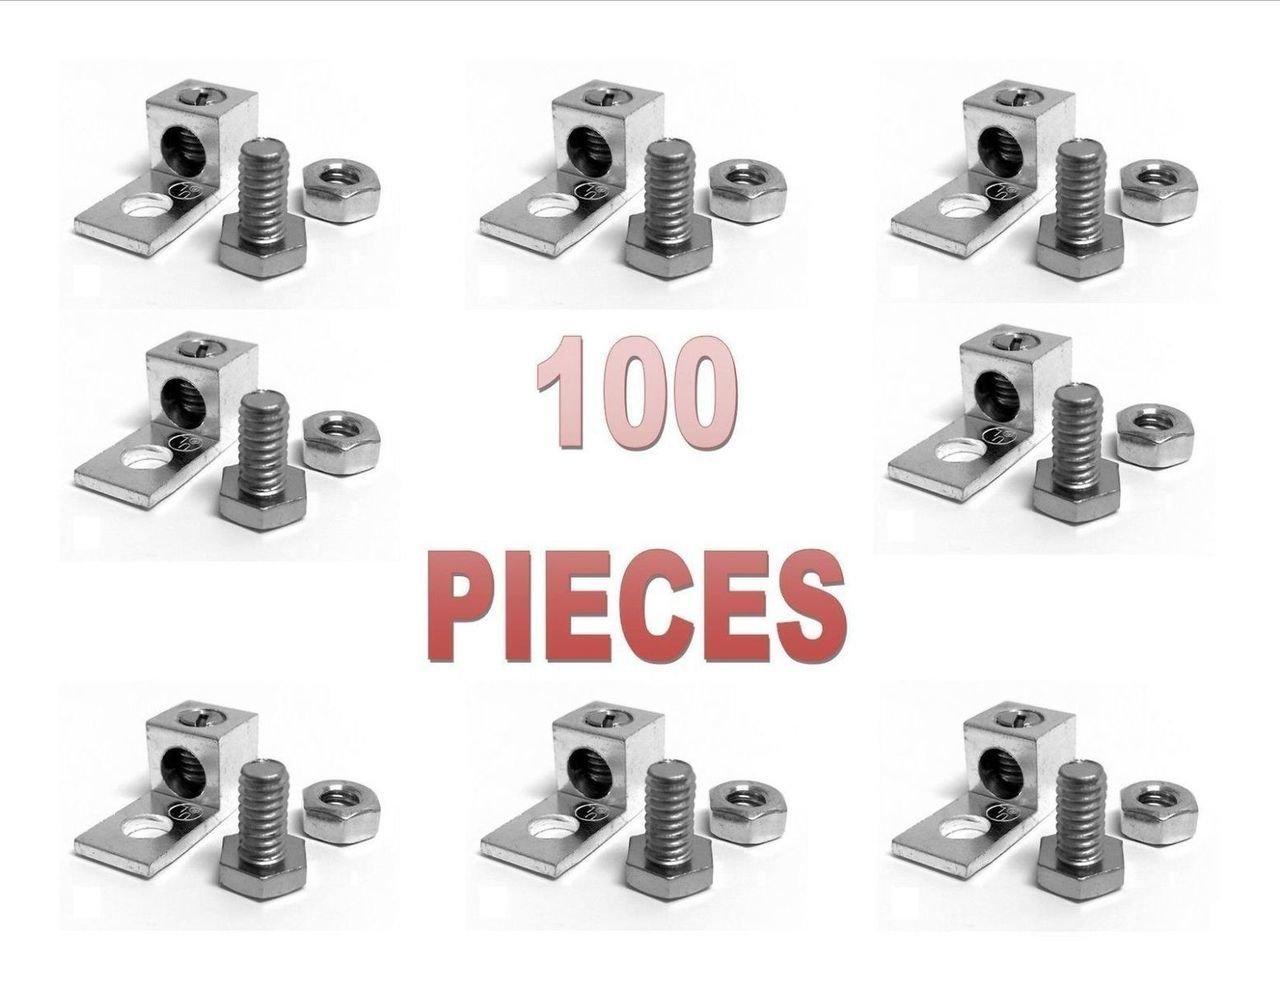 100 Pieces P10 Single Aluminum Ground Lug Block Direct TV Satellite UL Listed